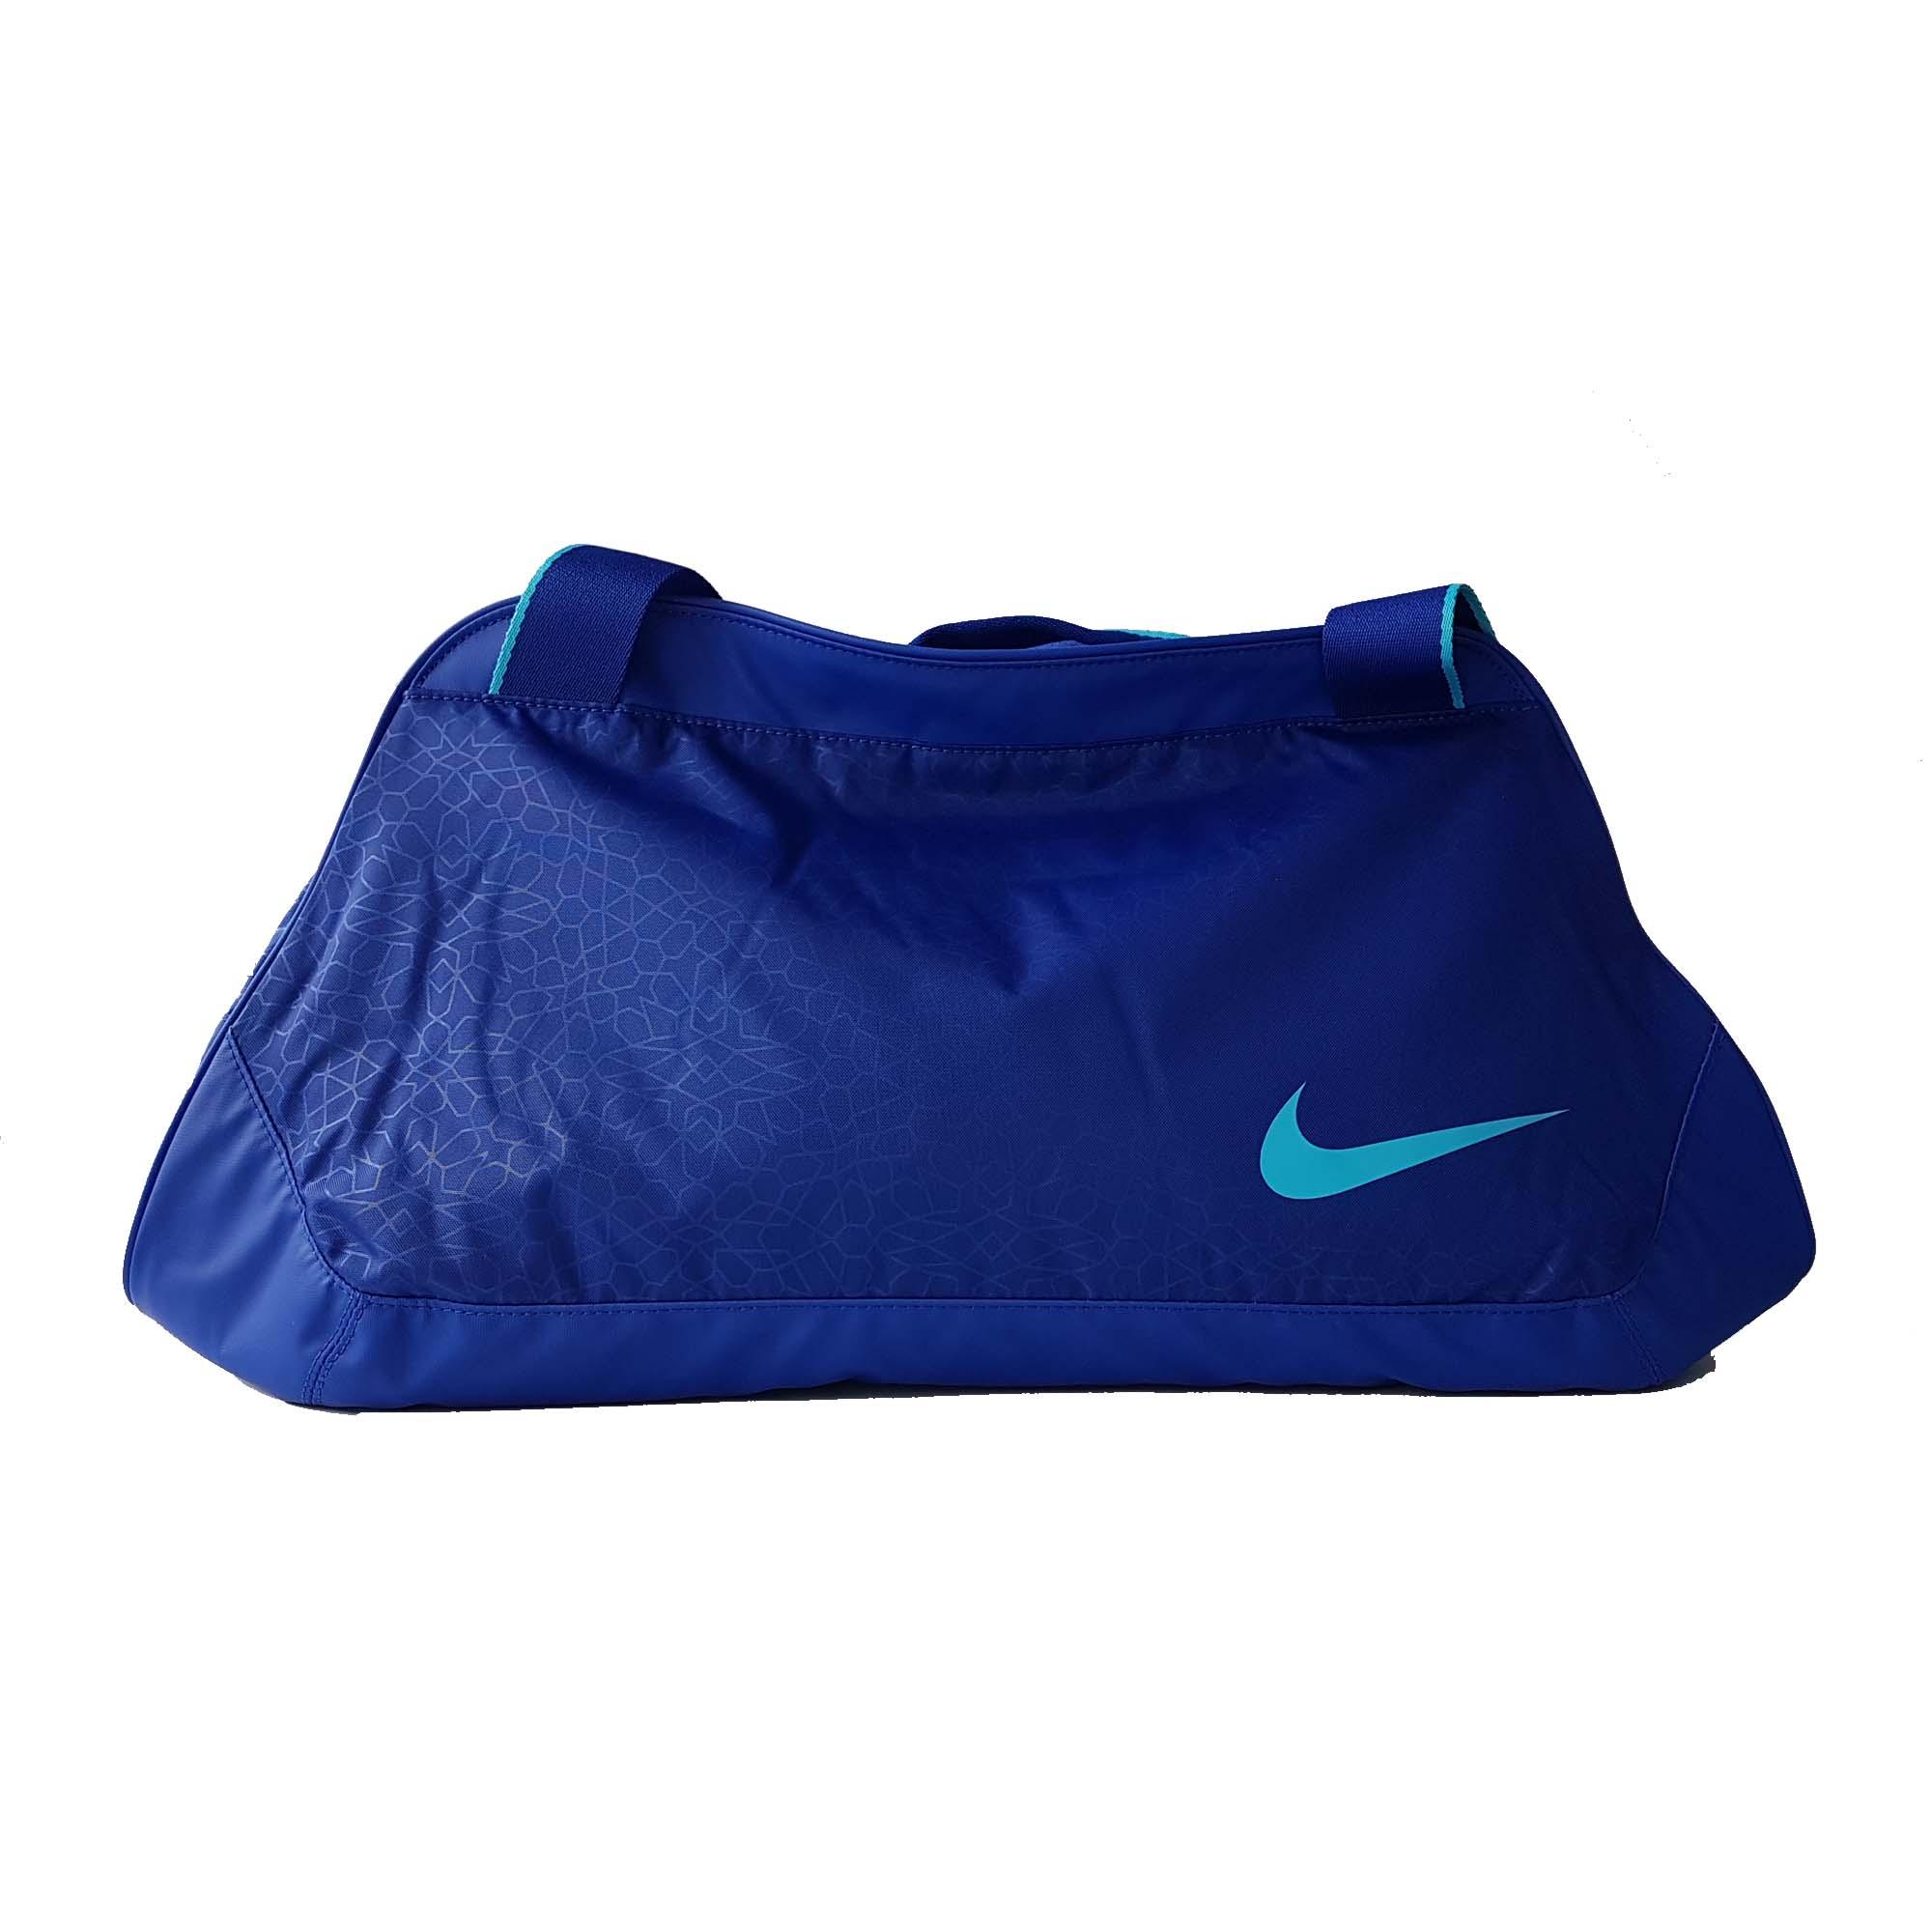 Nike Damen Sporttasche Legend Club - SMU NFS BZ9754-455